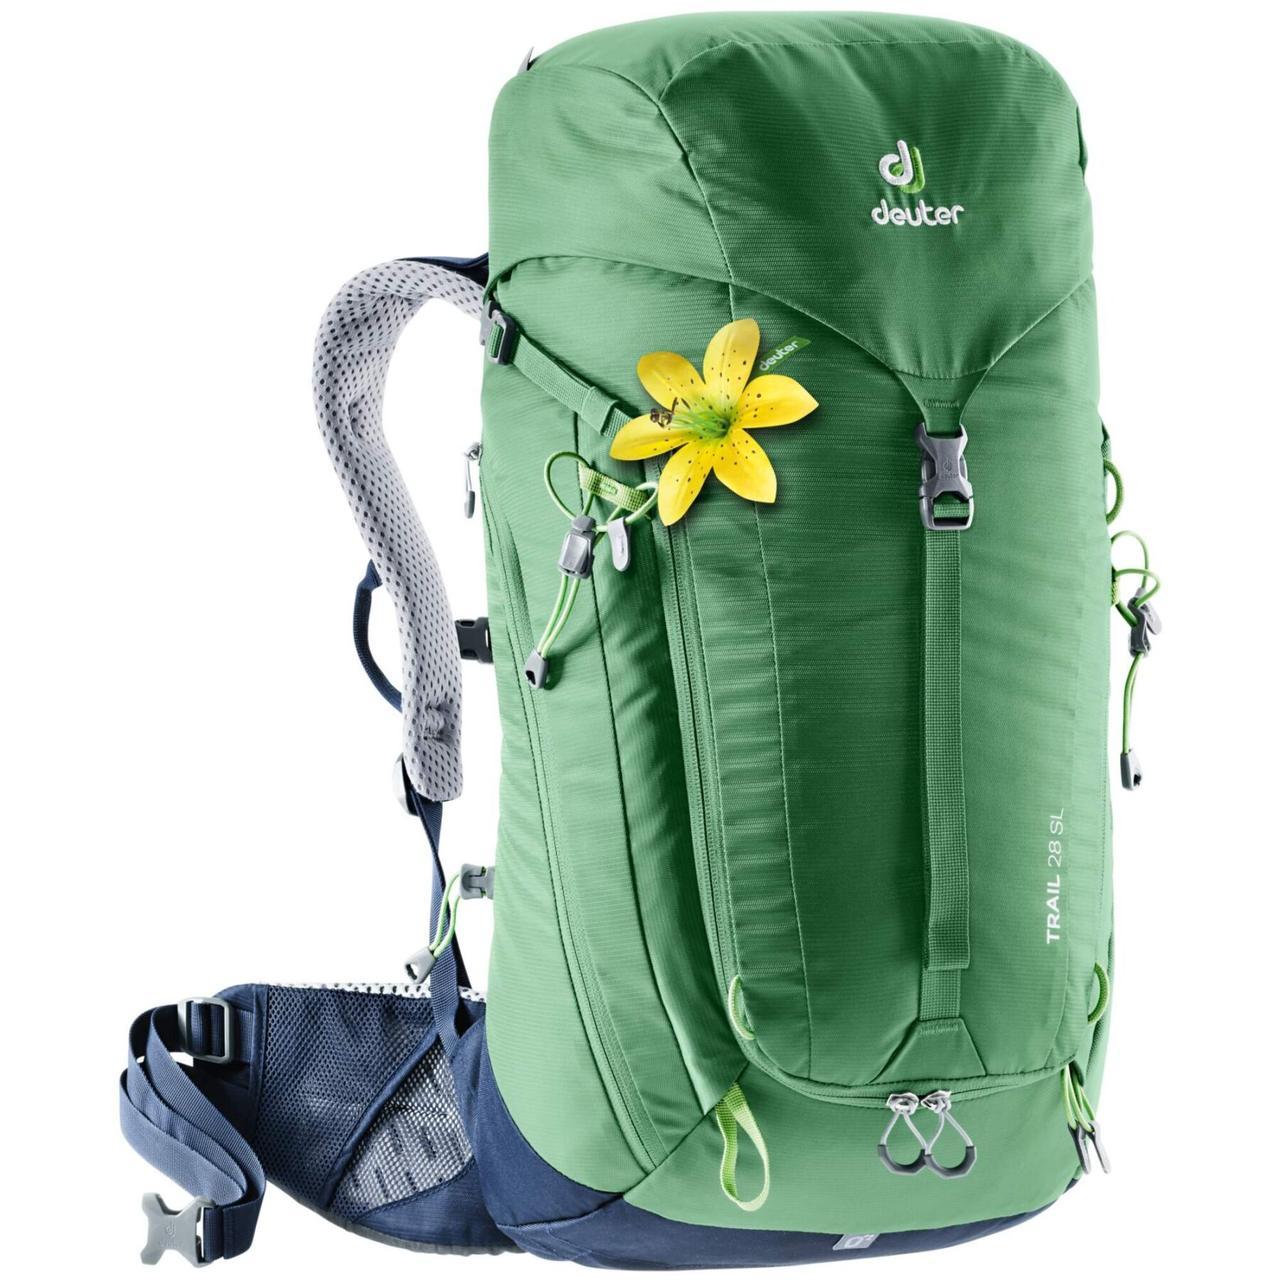 Рюкзак Deuter Trail 28 SL leaf-navy (3440419 2326)